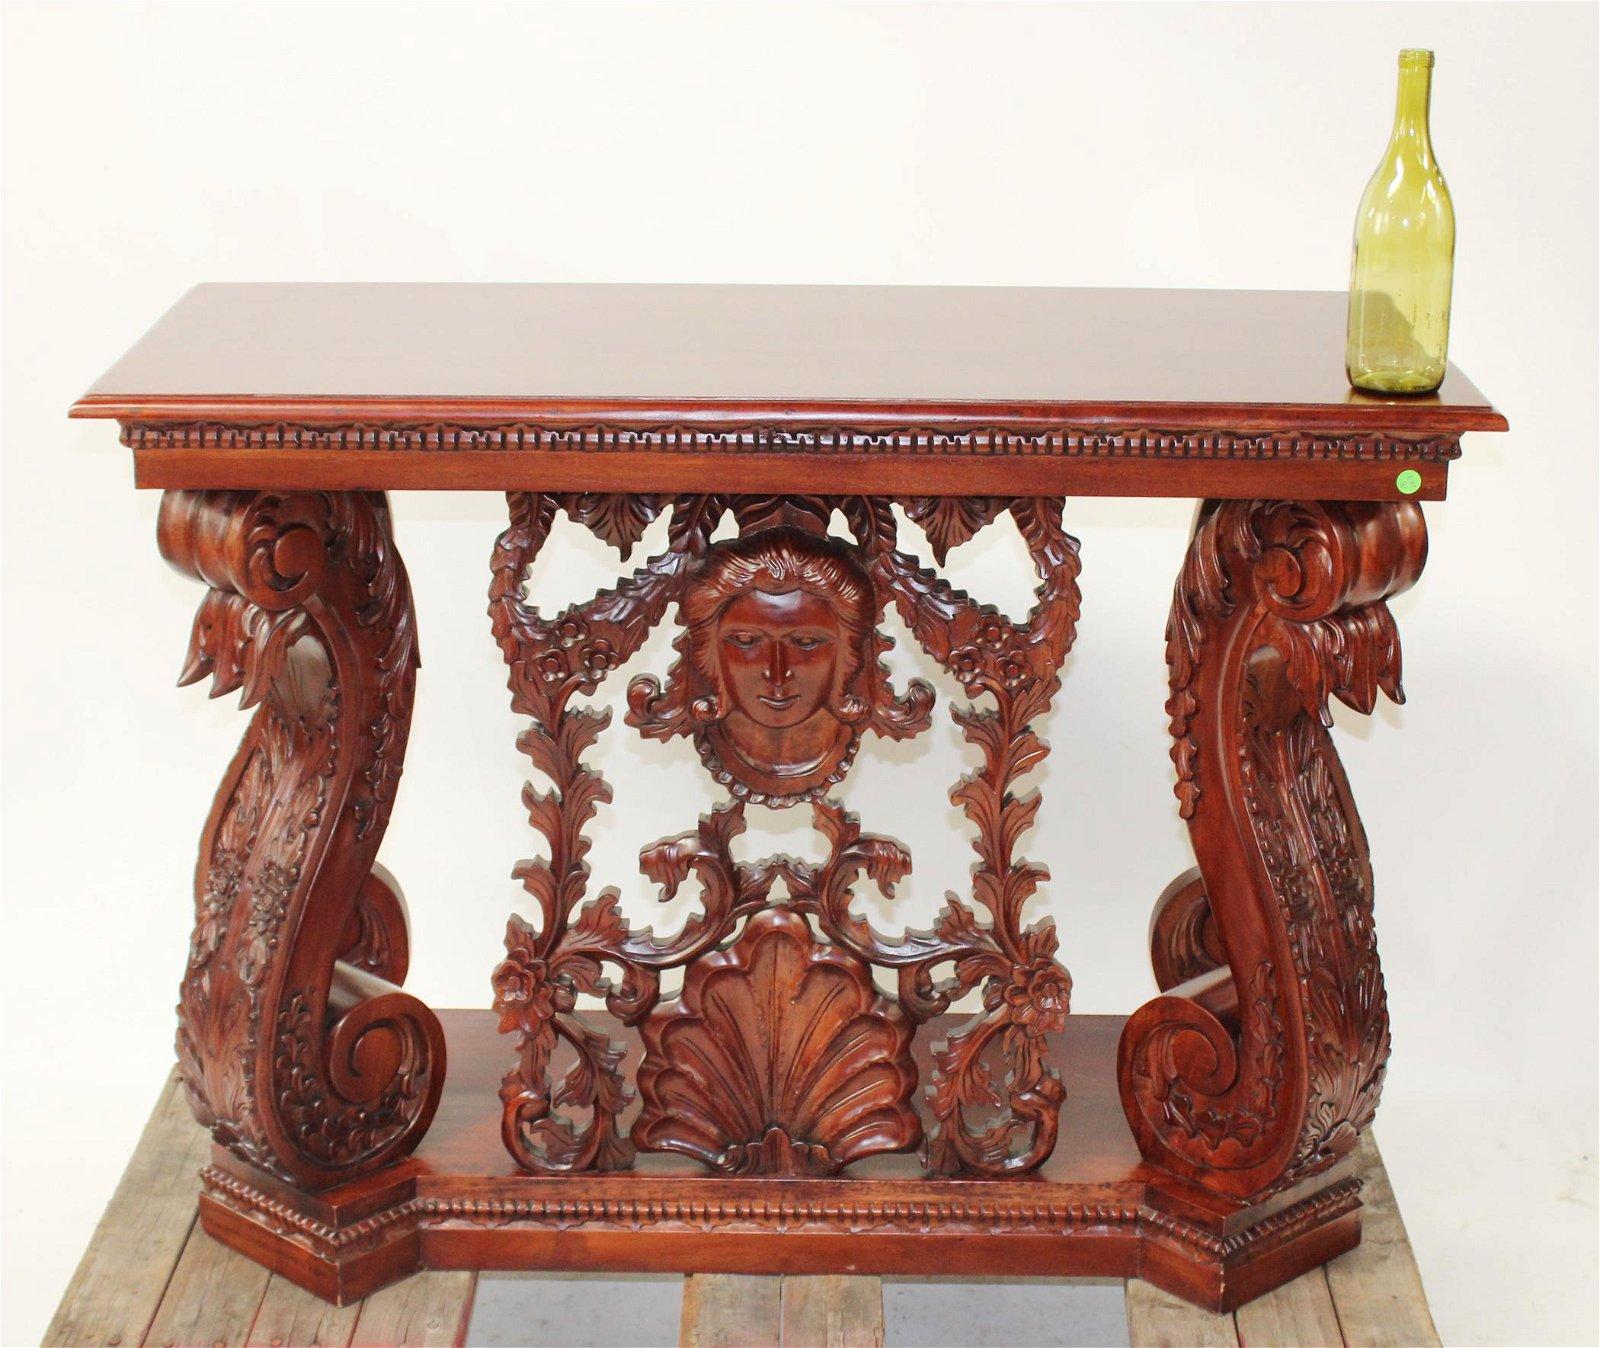 Renaissance style carved mahogany console